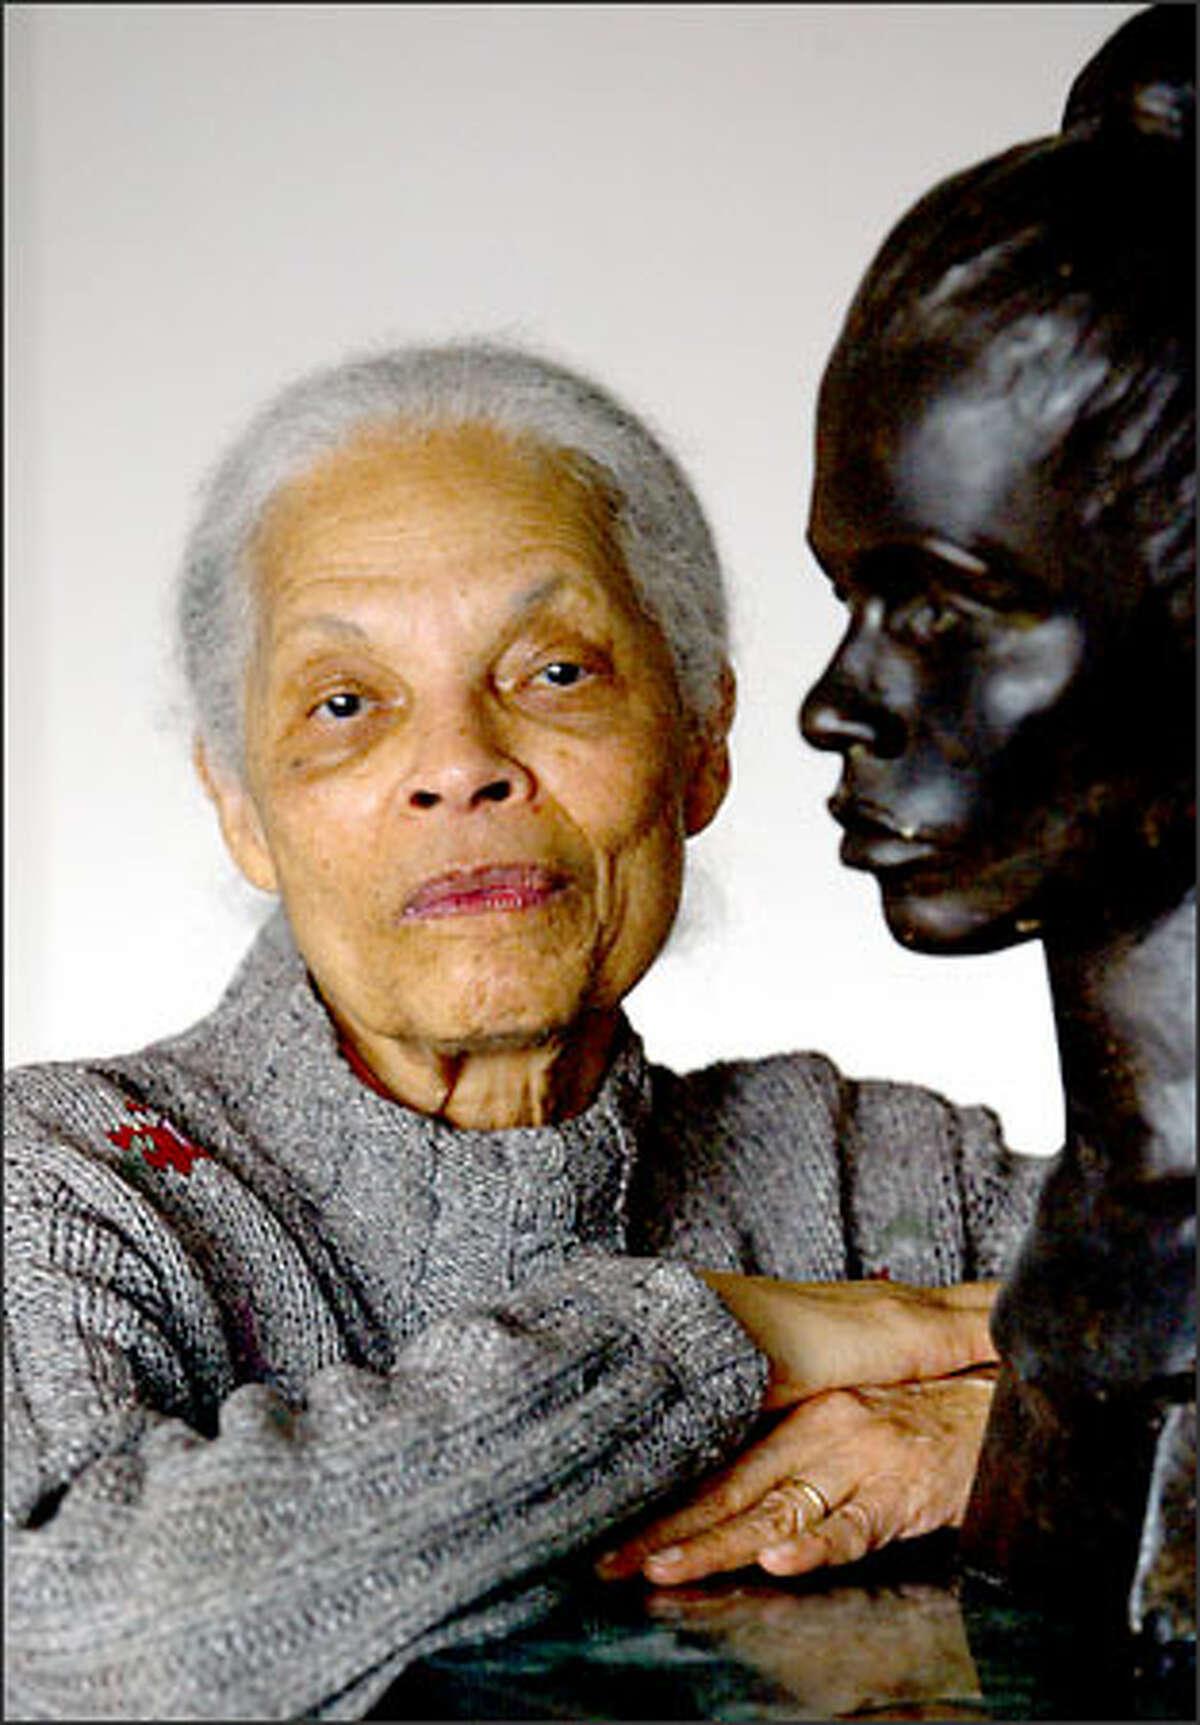 Gwen Knight's retrospective exhibit is at La Conner's Museum of Northwest Art through Jan. 4.